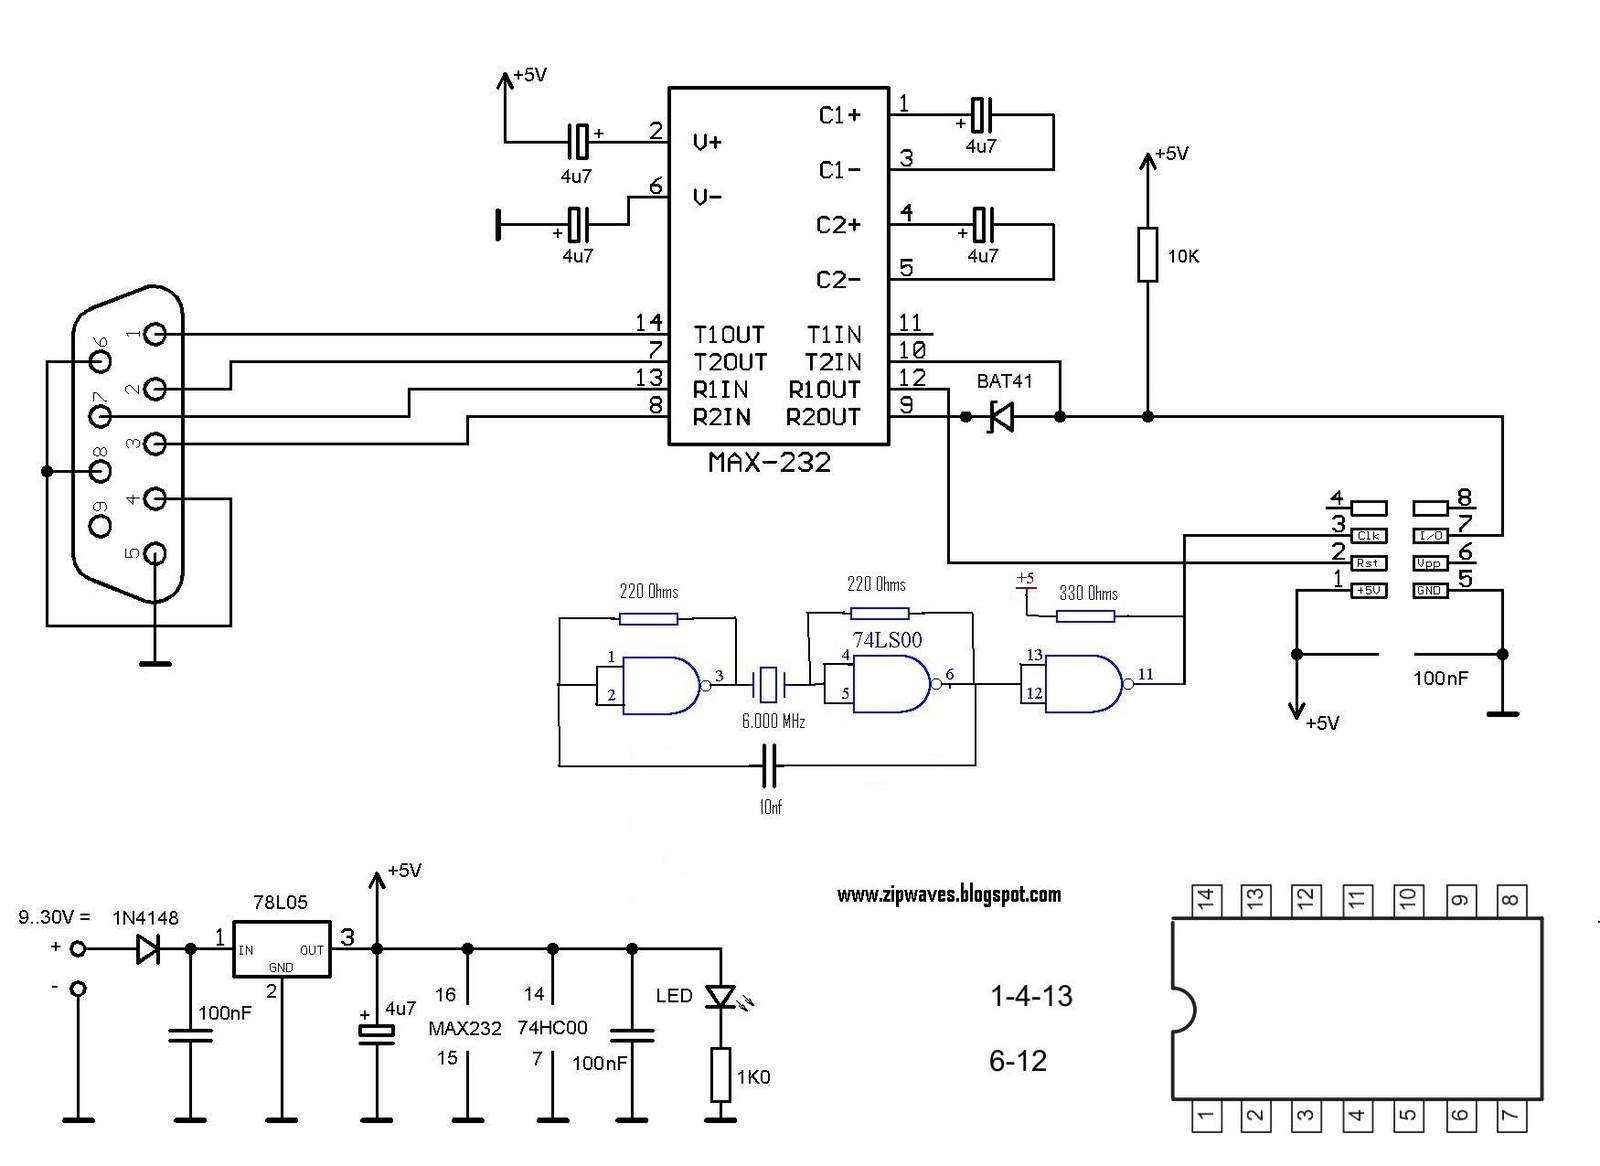 smart card wiring diagram wiring diagram g9 smart card wiring diagram [ 1600 x 1166 Pixel ]